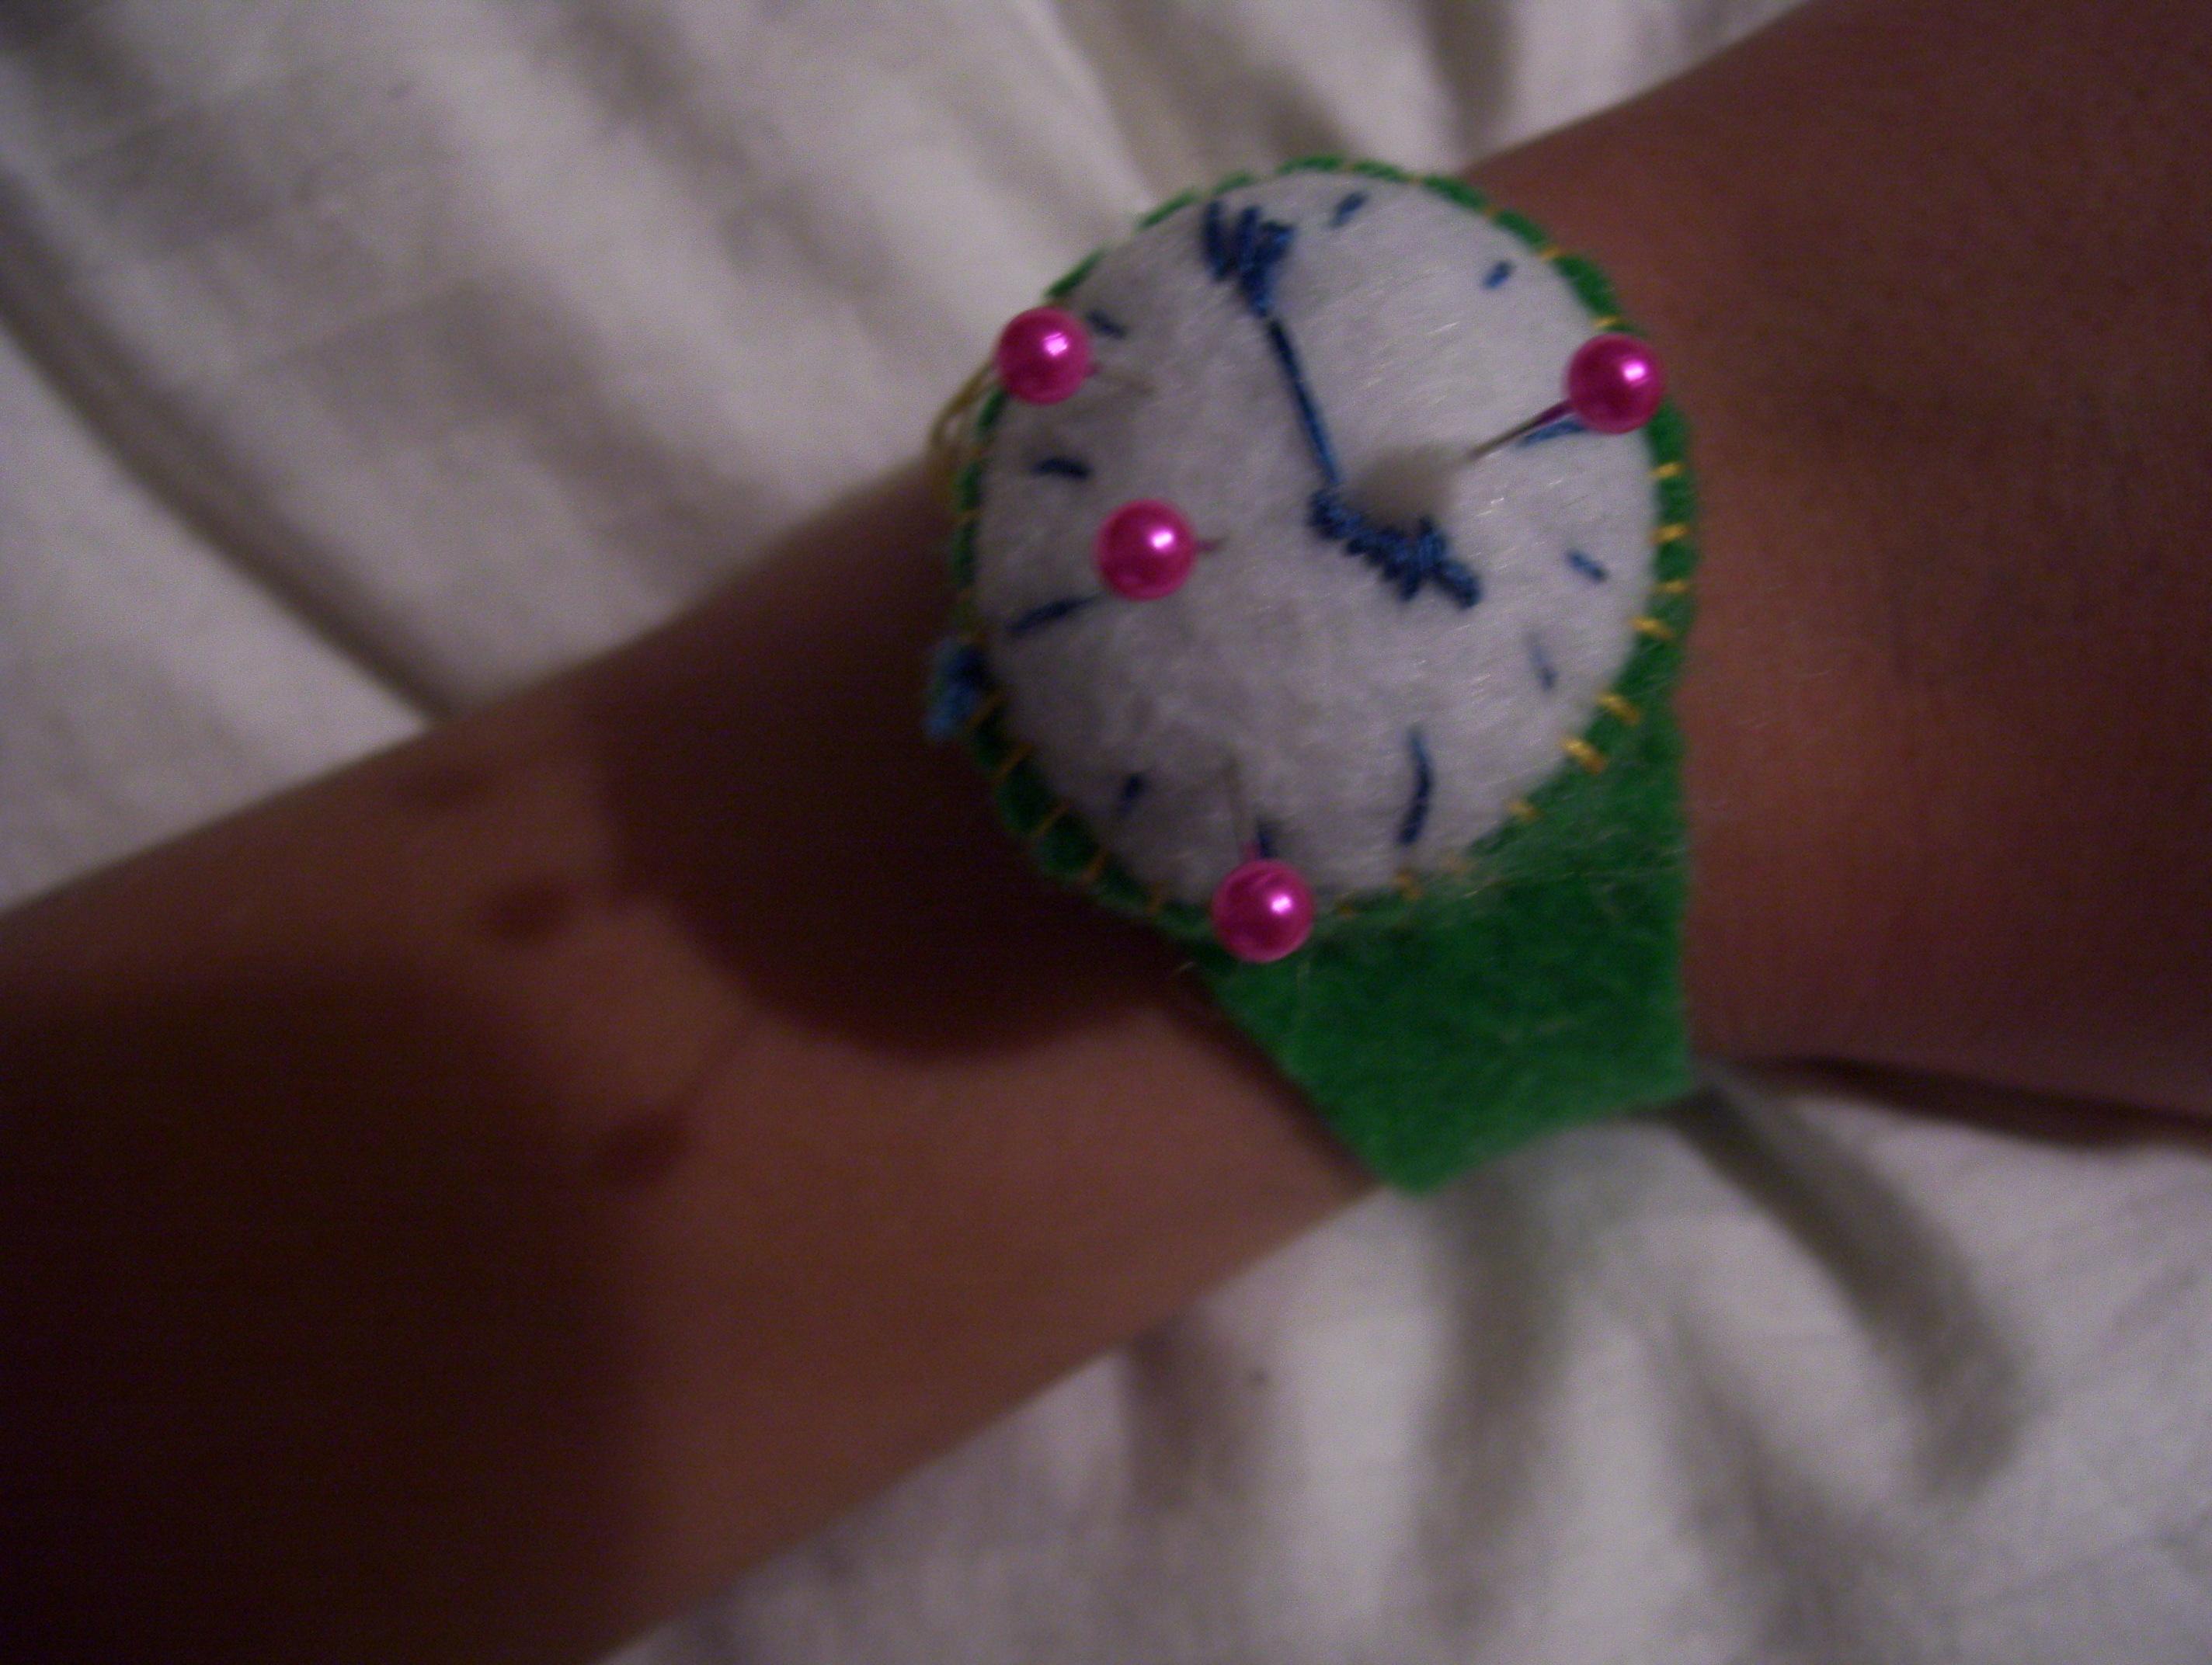 Wrist-watch pin cushion